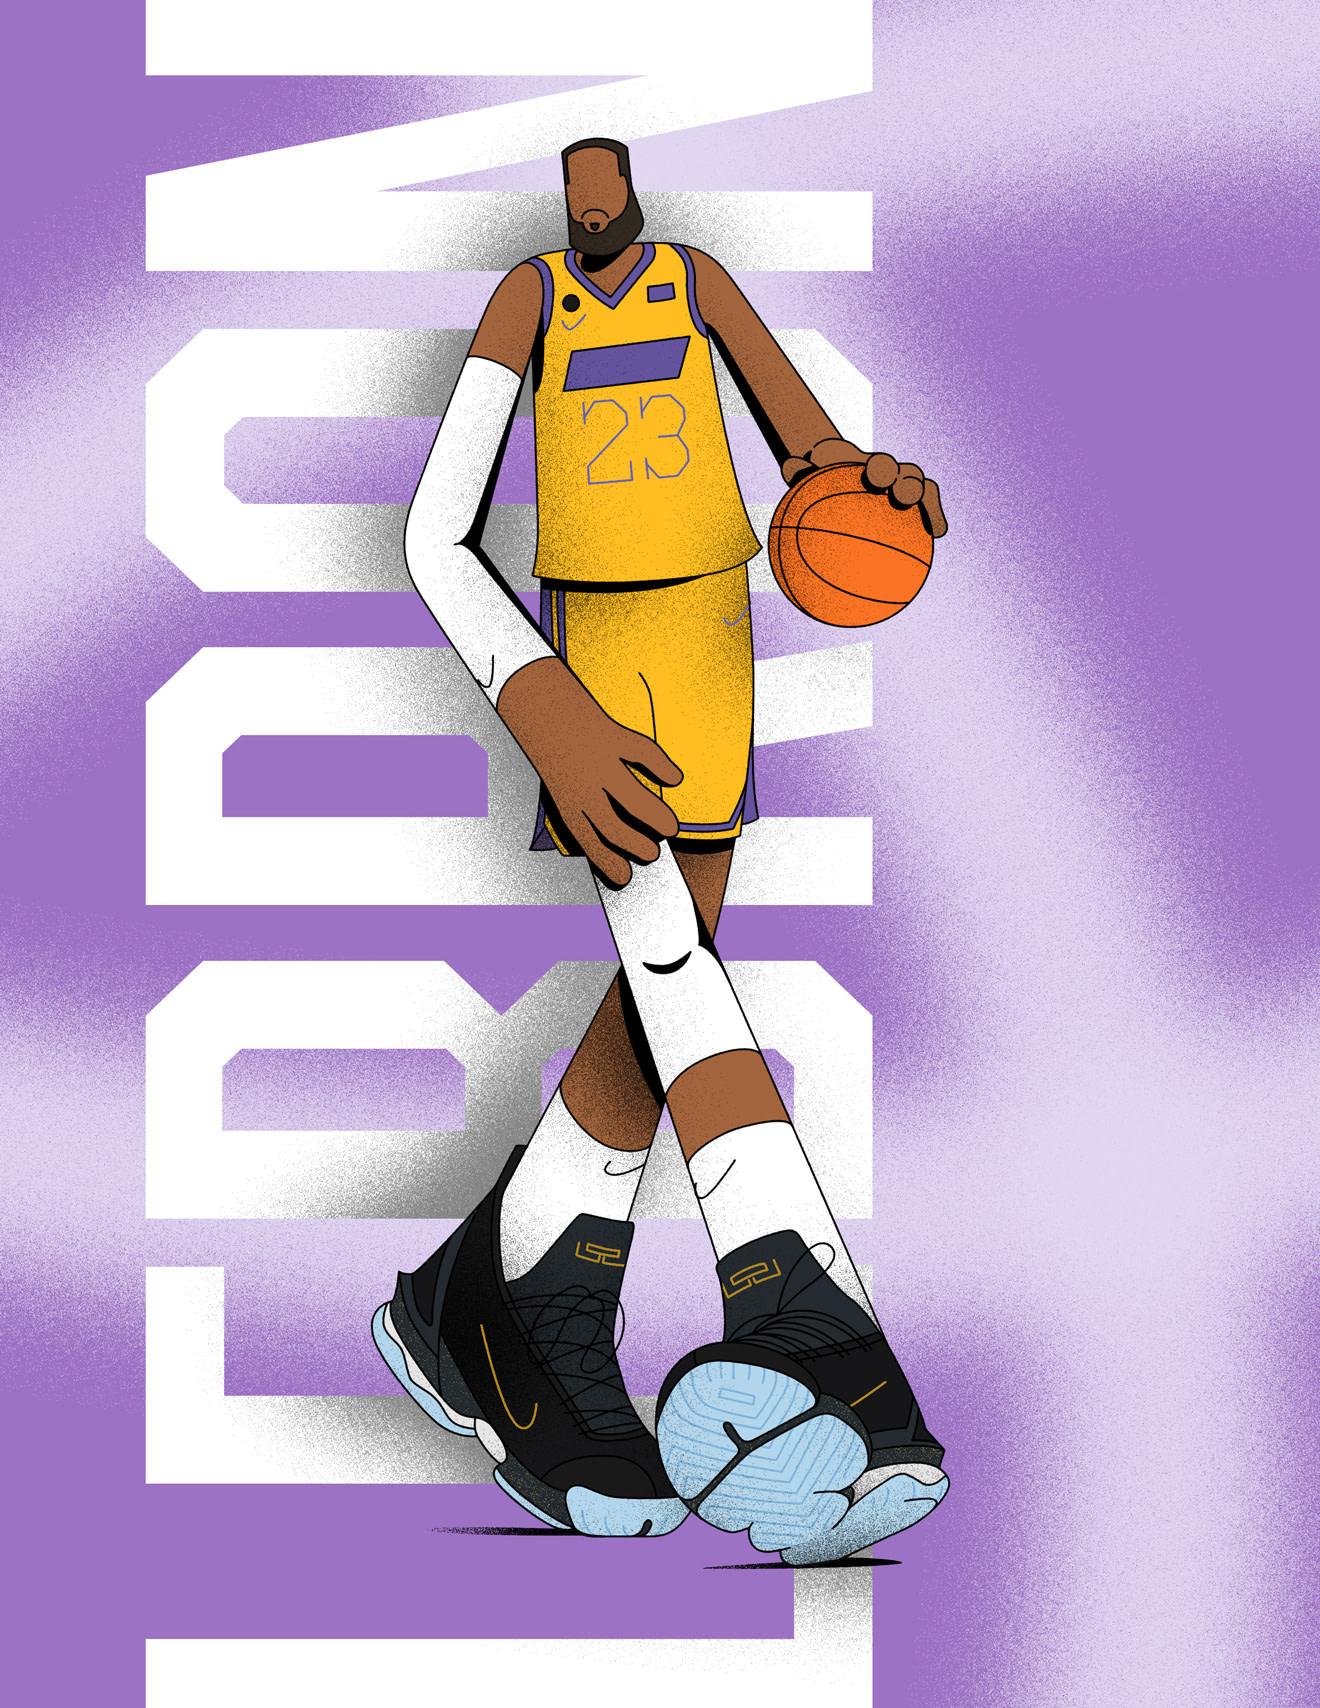 Illustration of basketball player, LeBron James, mid-dunk